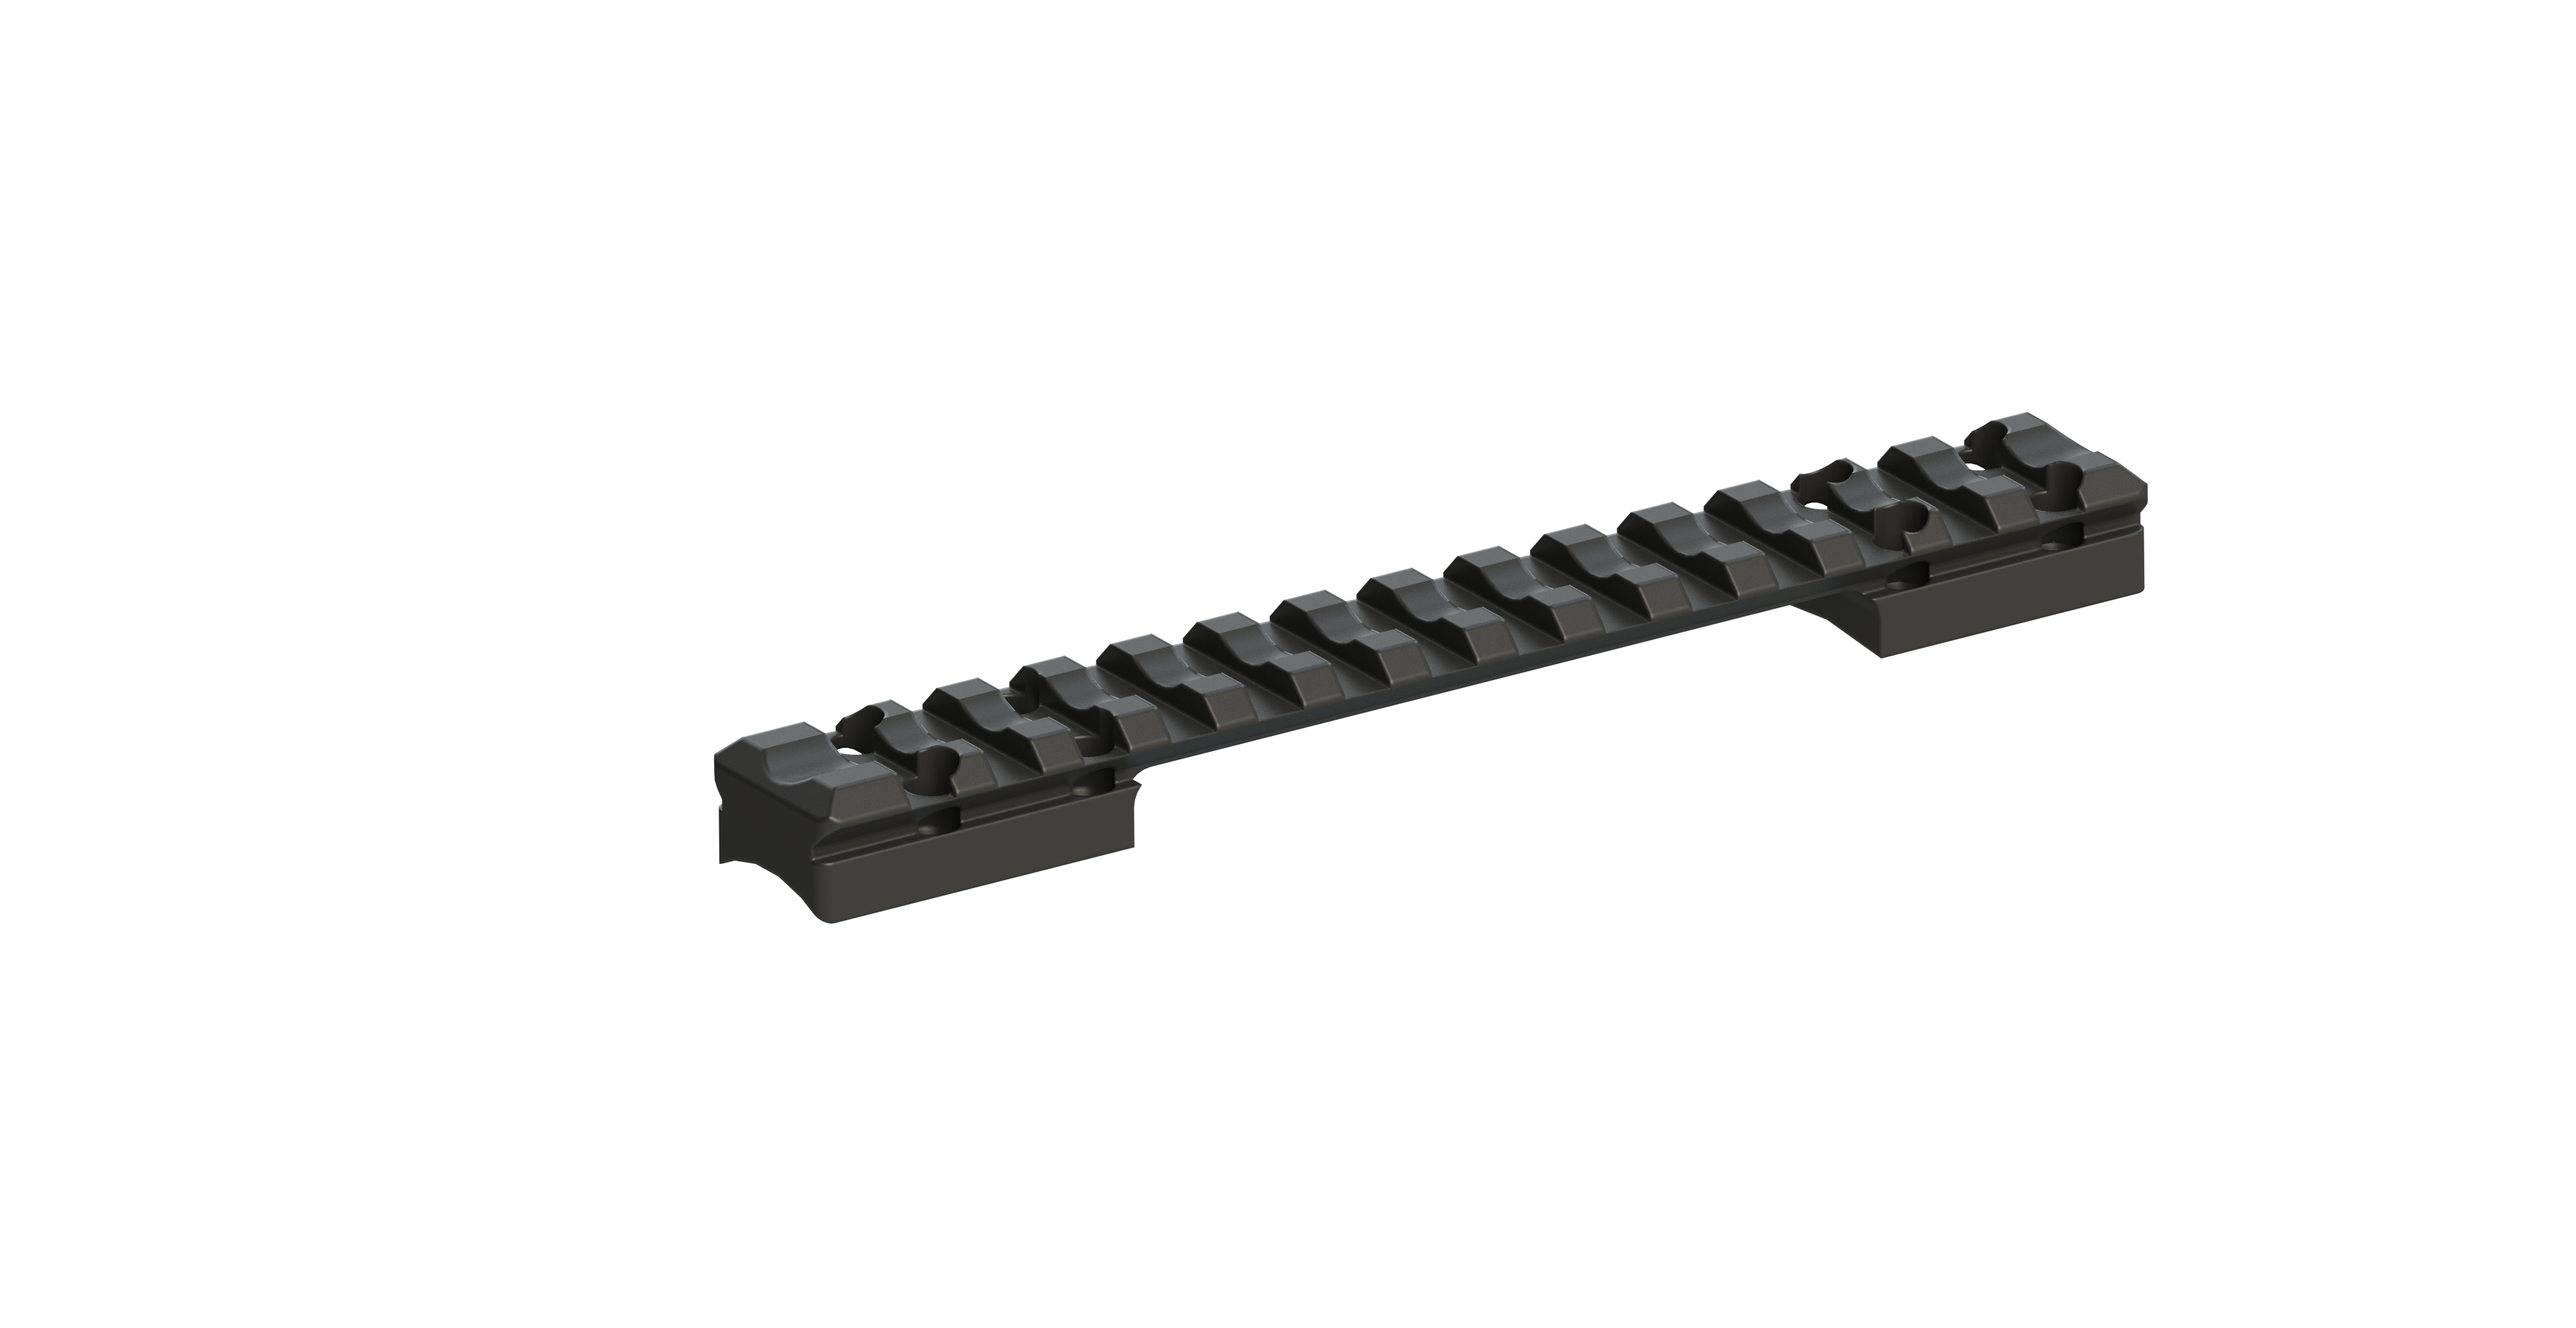 Recknagel Picatinny Schiene FN Browning - X-Bolt long